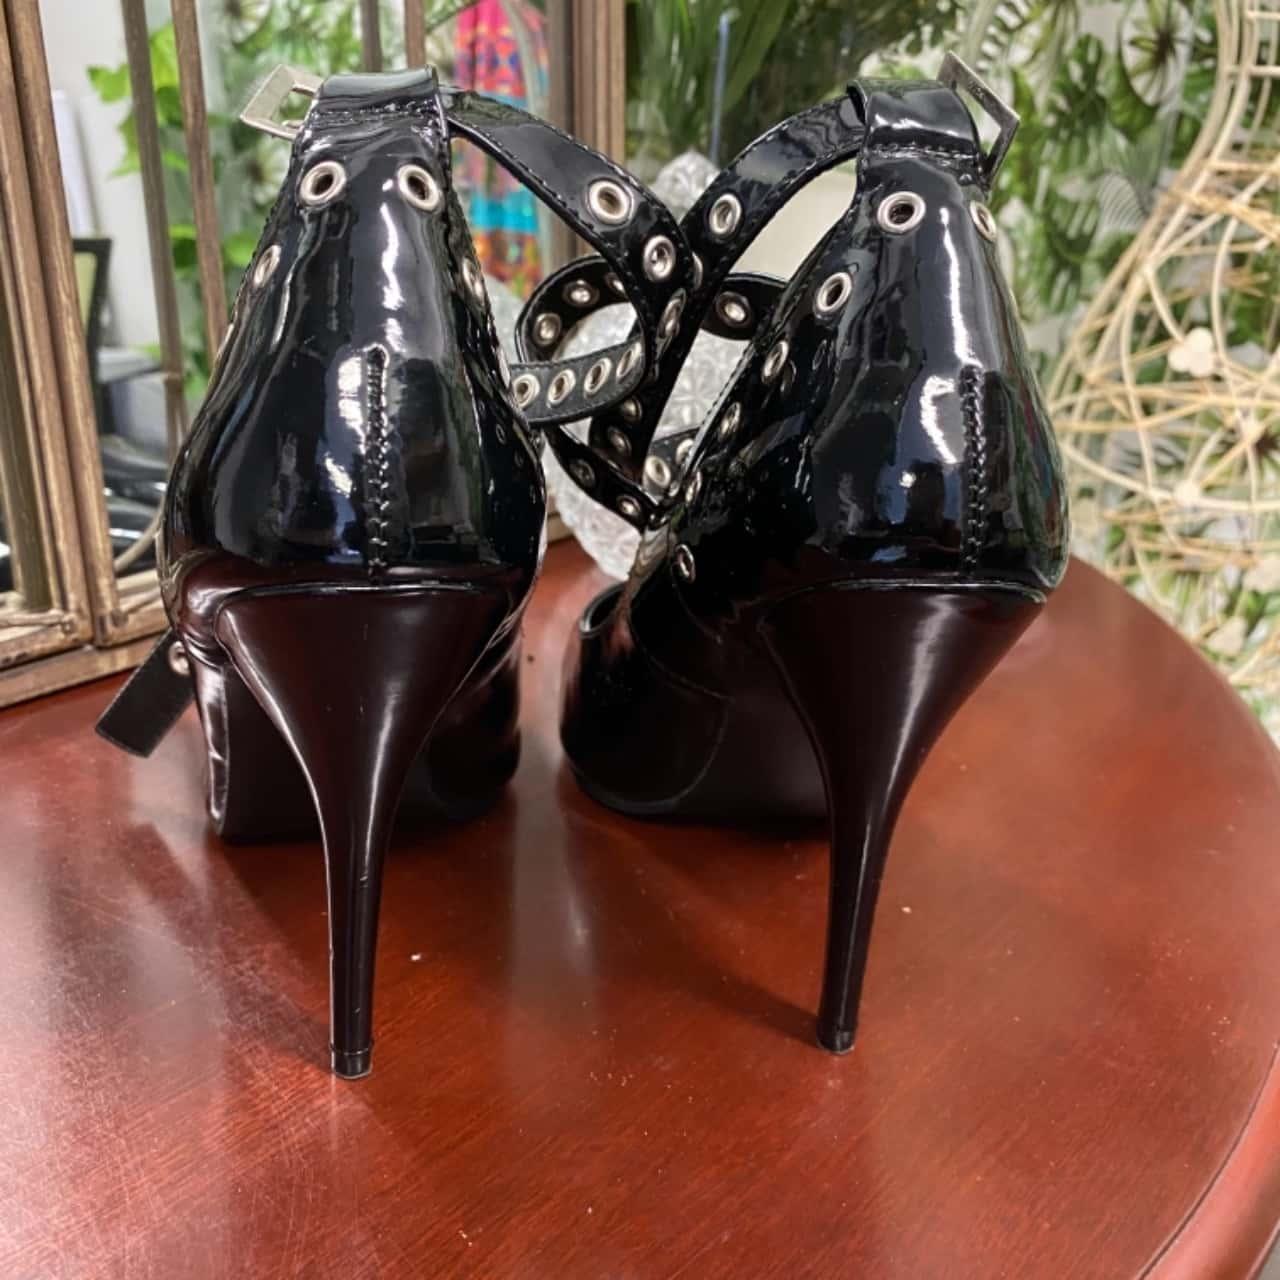 Pleaser Women's Stiletto Heels  Size 8/8.5 Black  Seduce